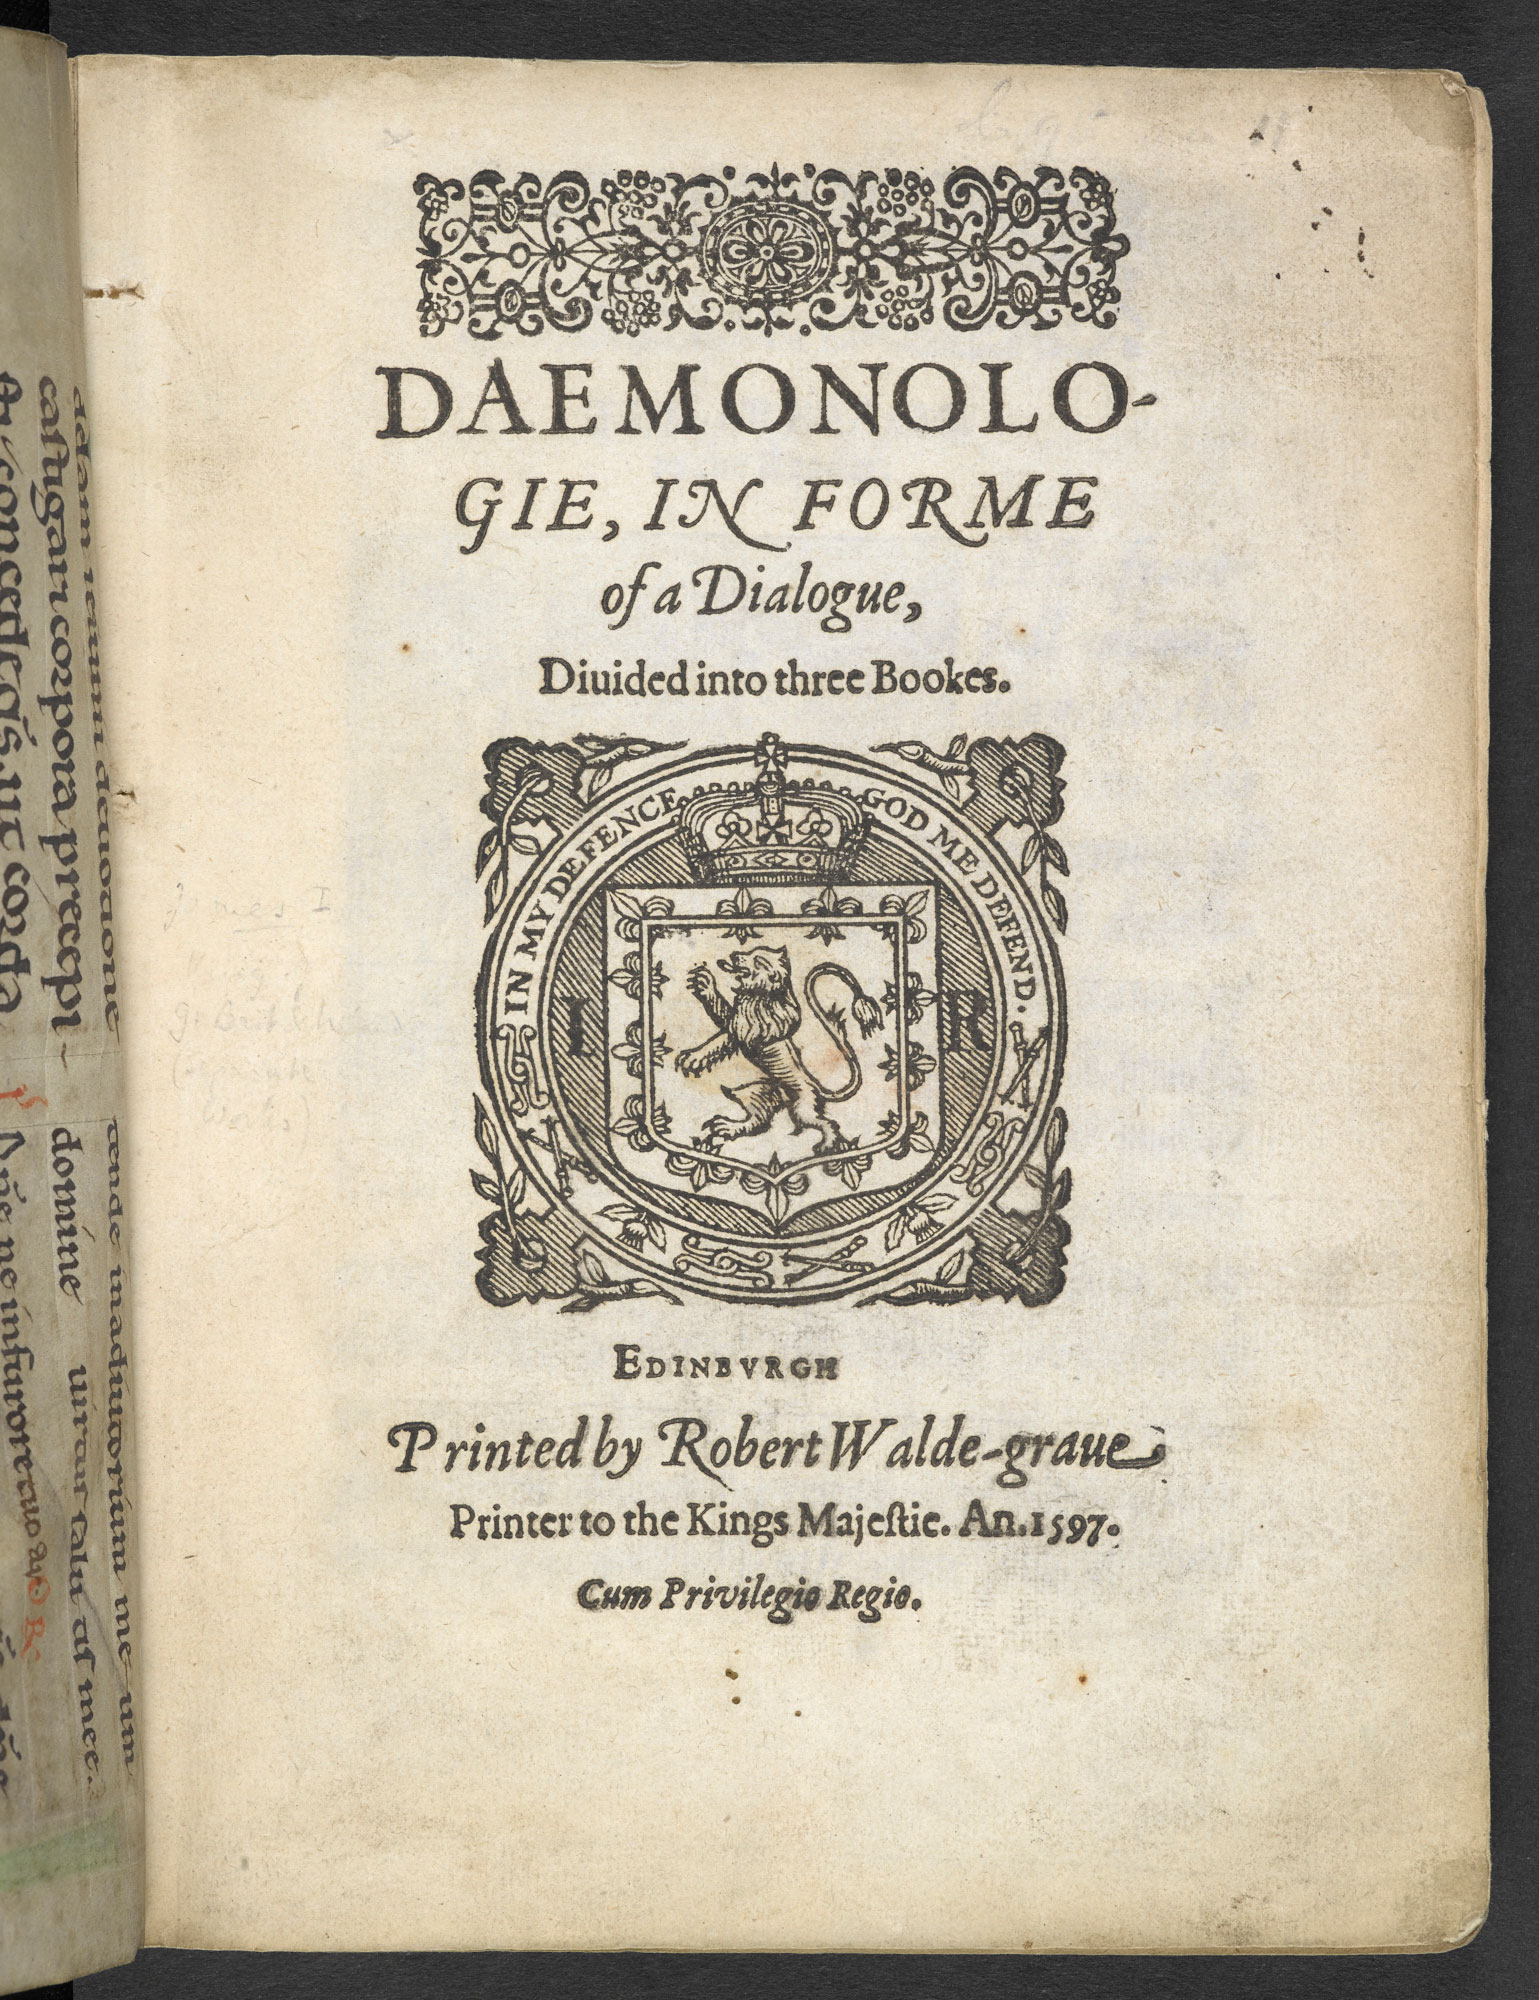 King James IV and I's Demonology, 1597